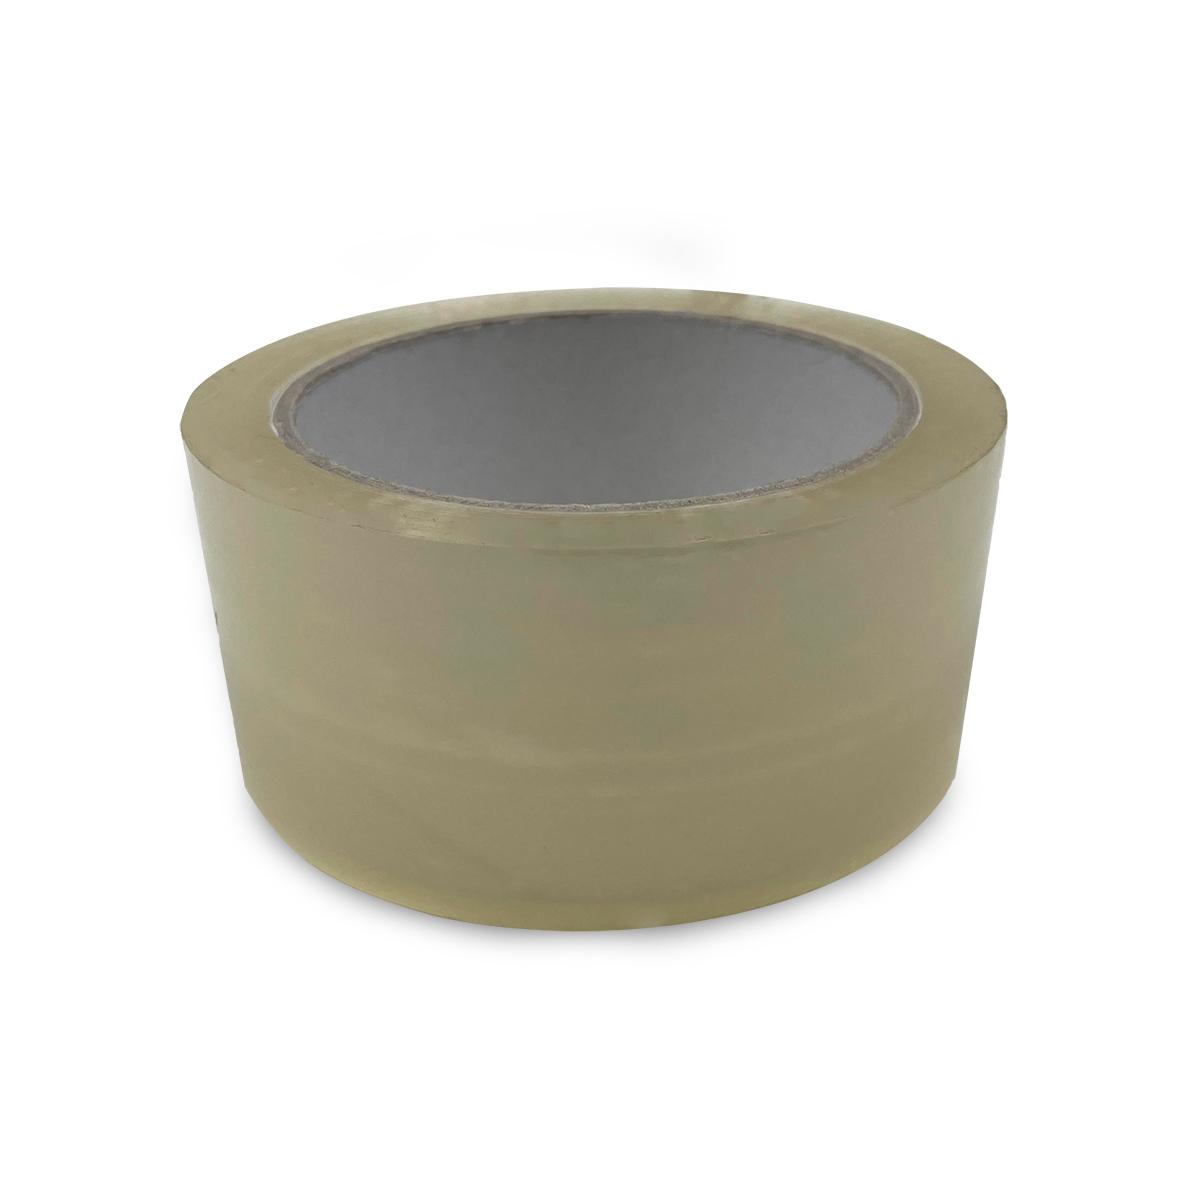 Tape-doozichtig-002-product